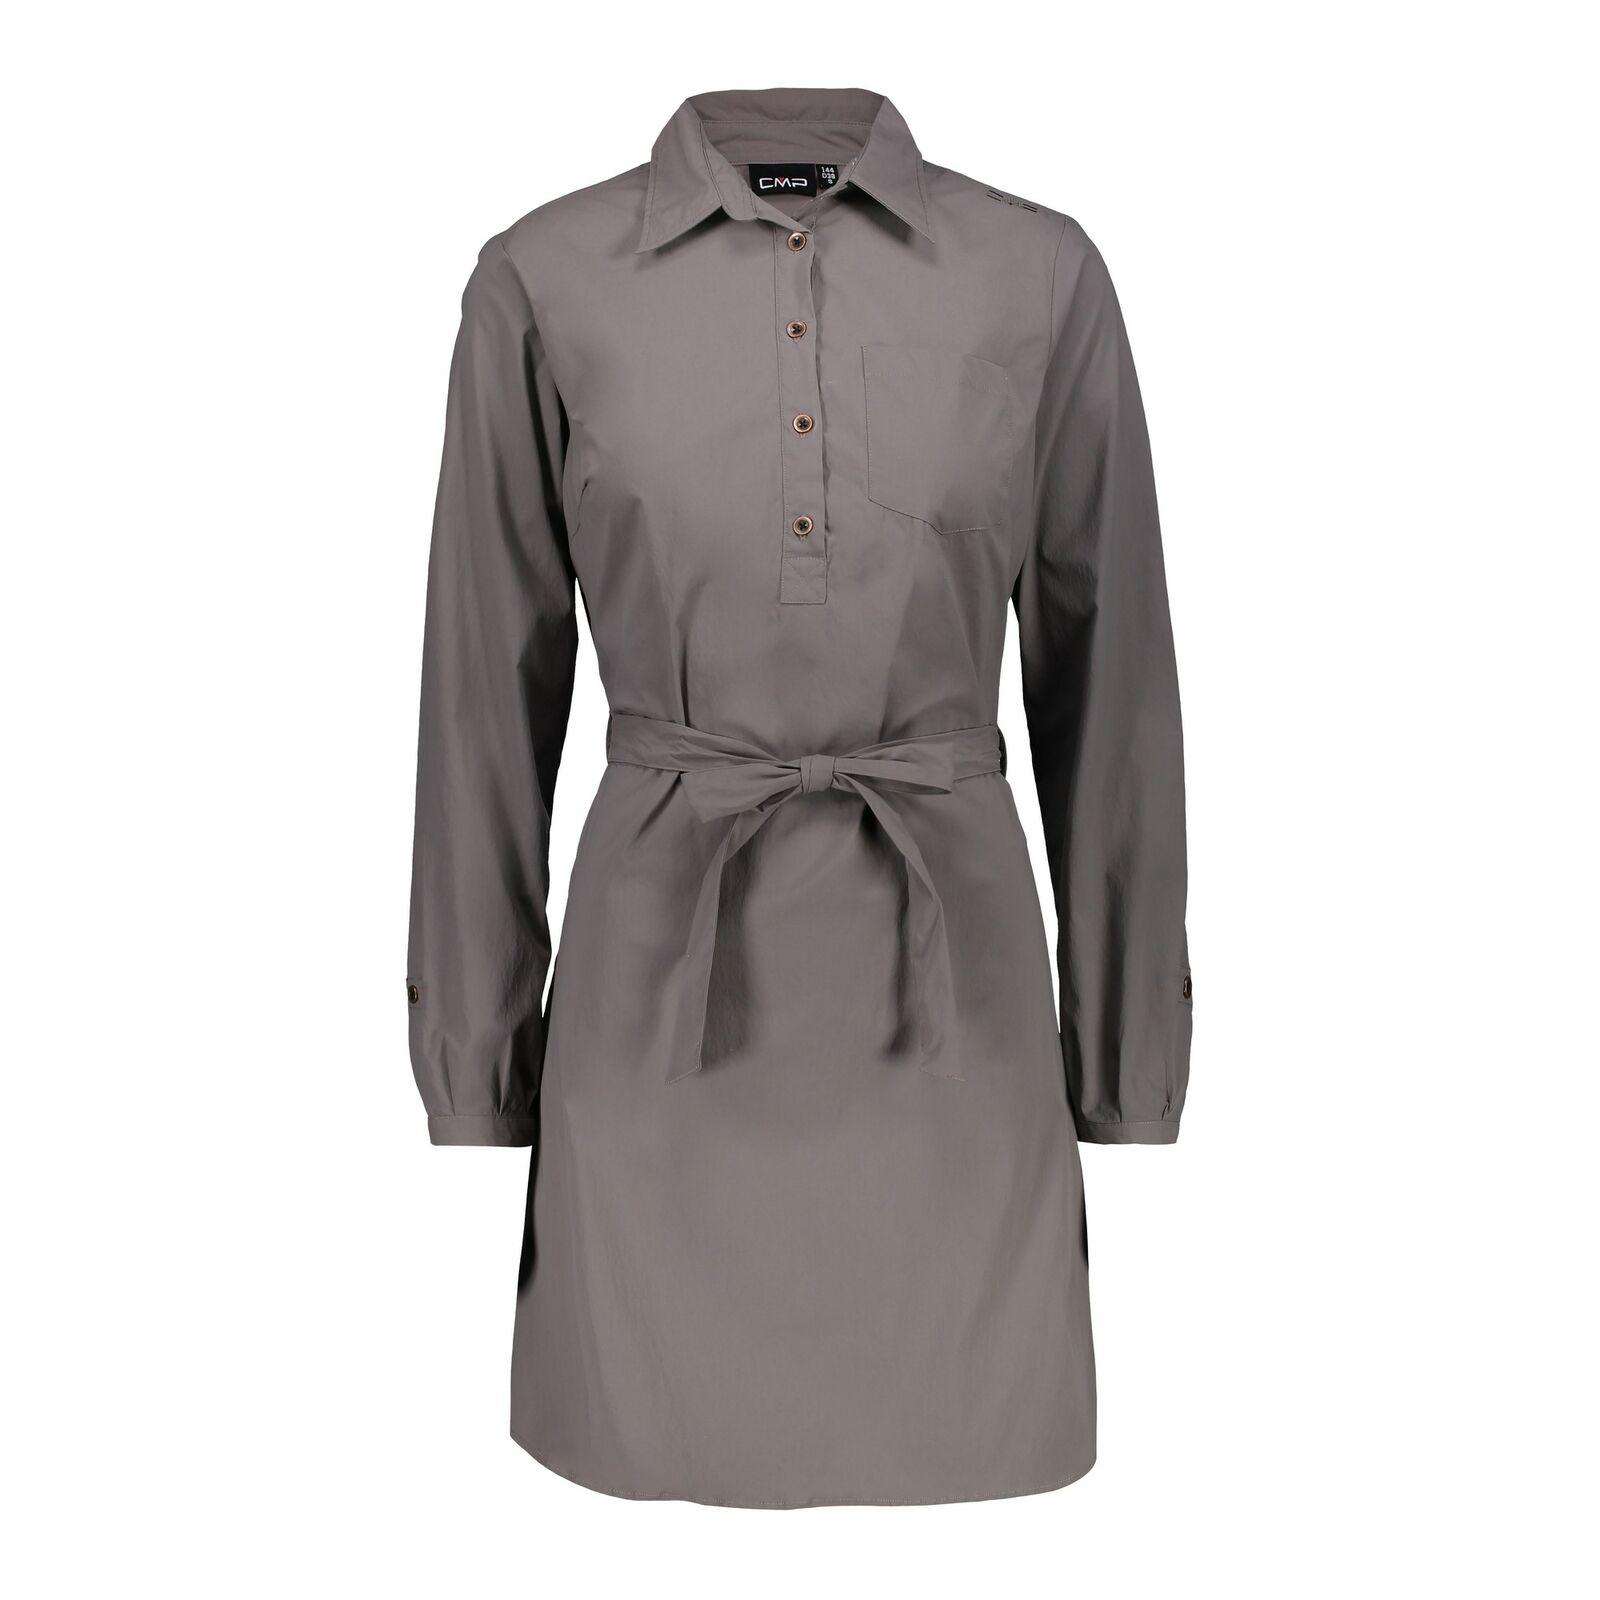 Mujer Vestido Vestido Vestido Vestido Cmp Vestido Camisa